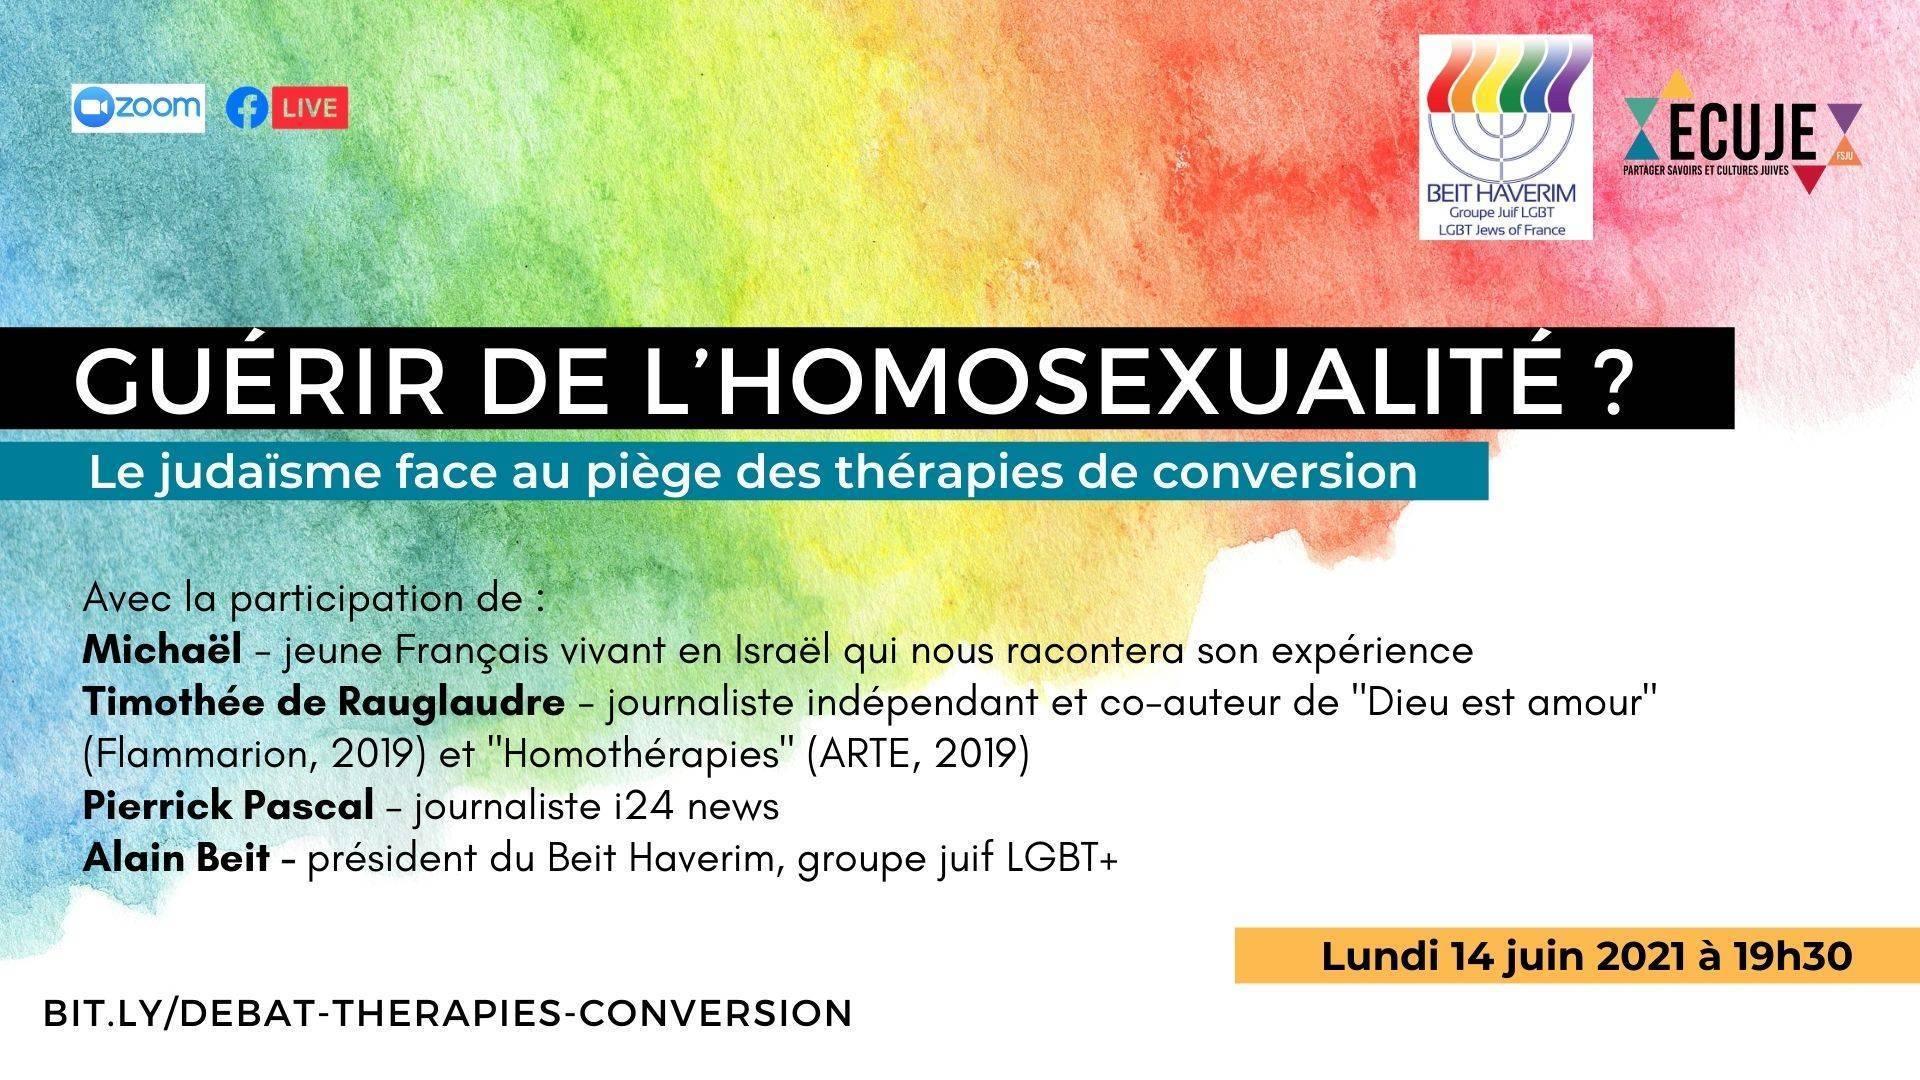 site rencontre pour gay therapy à Houilles